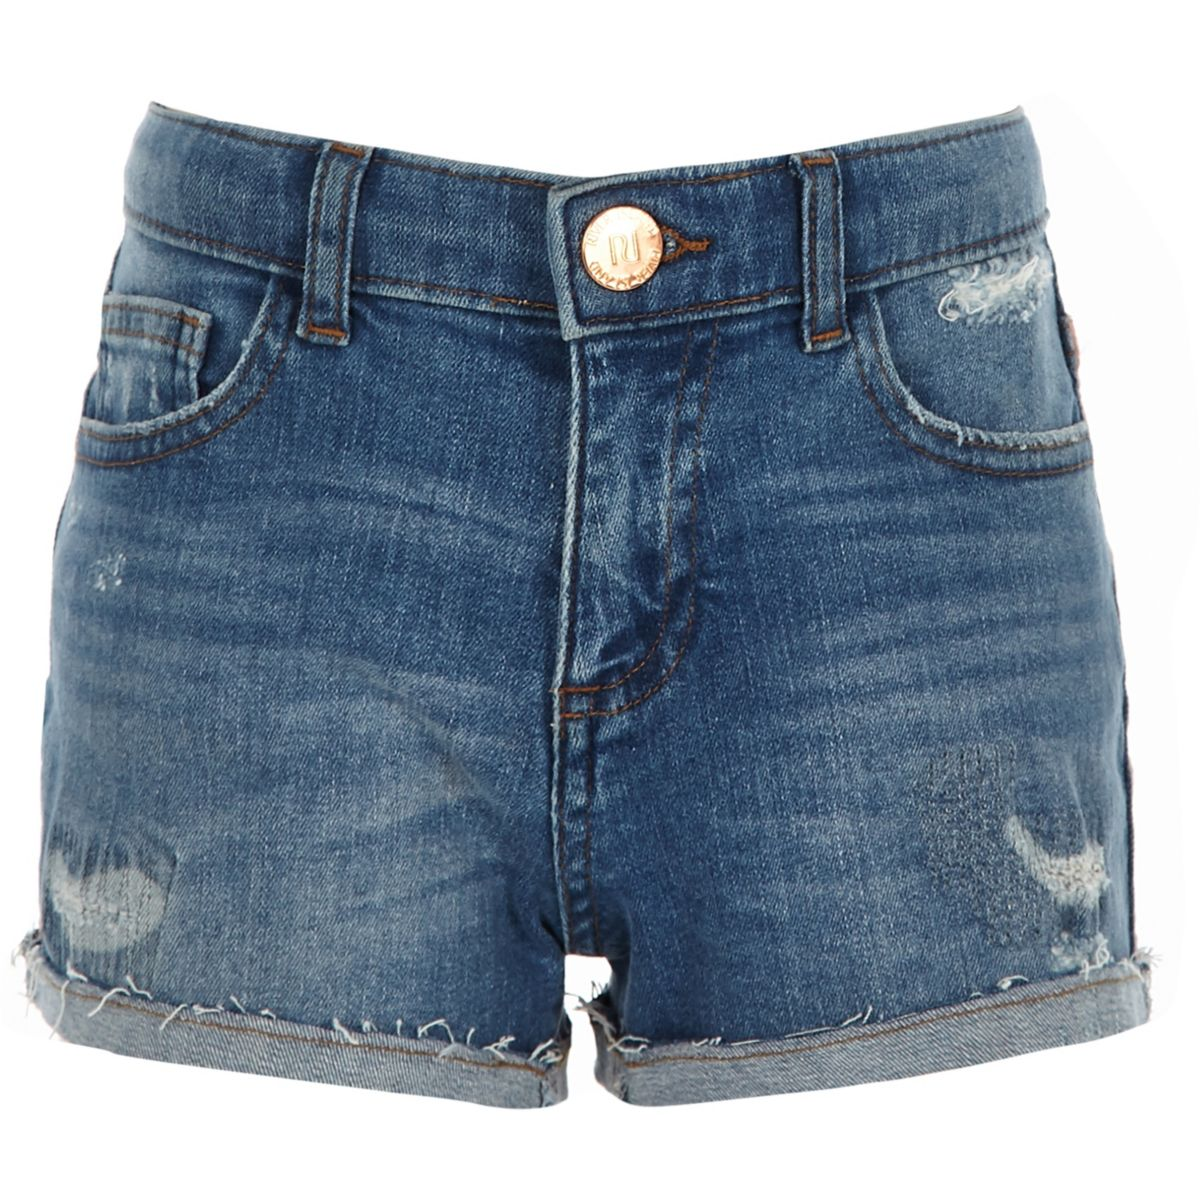 Girls Bella tape side denim boyfriend shorts